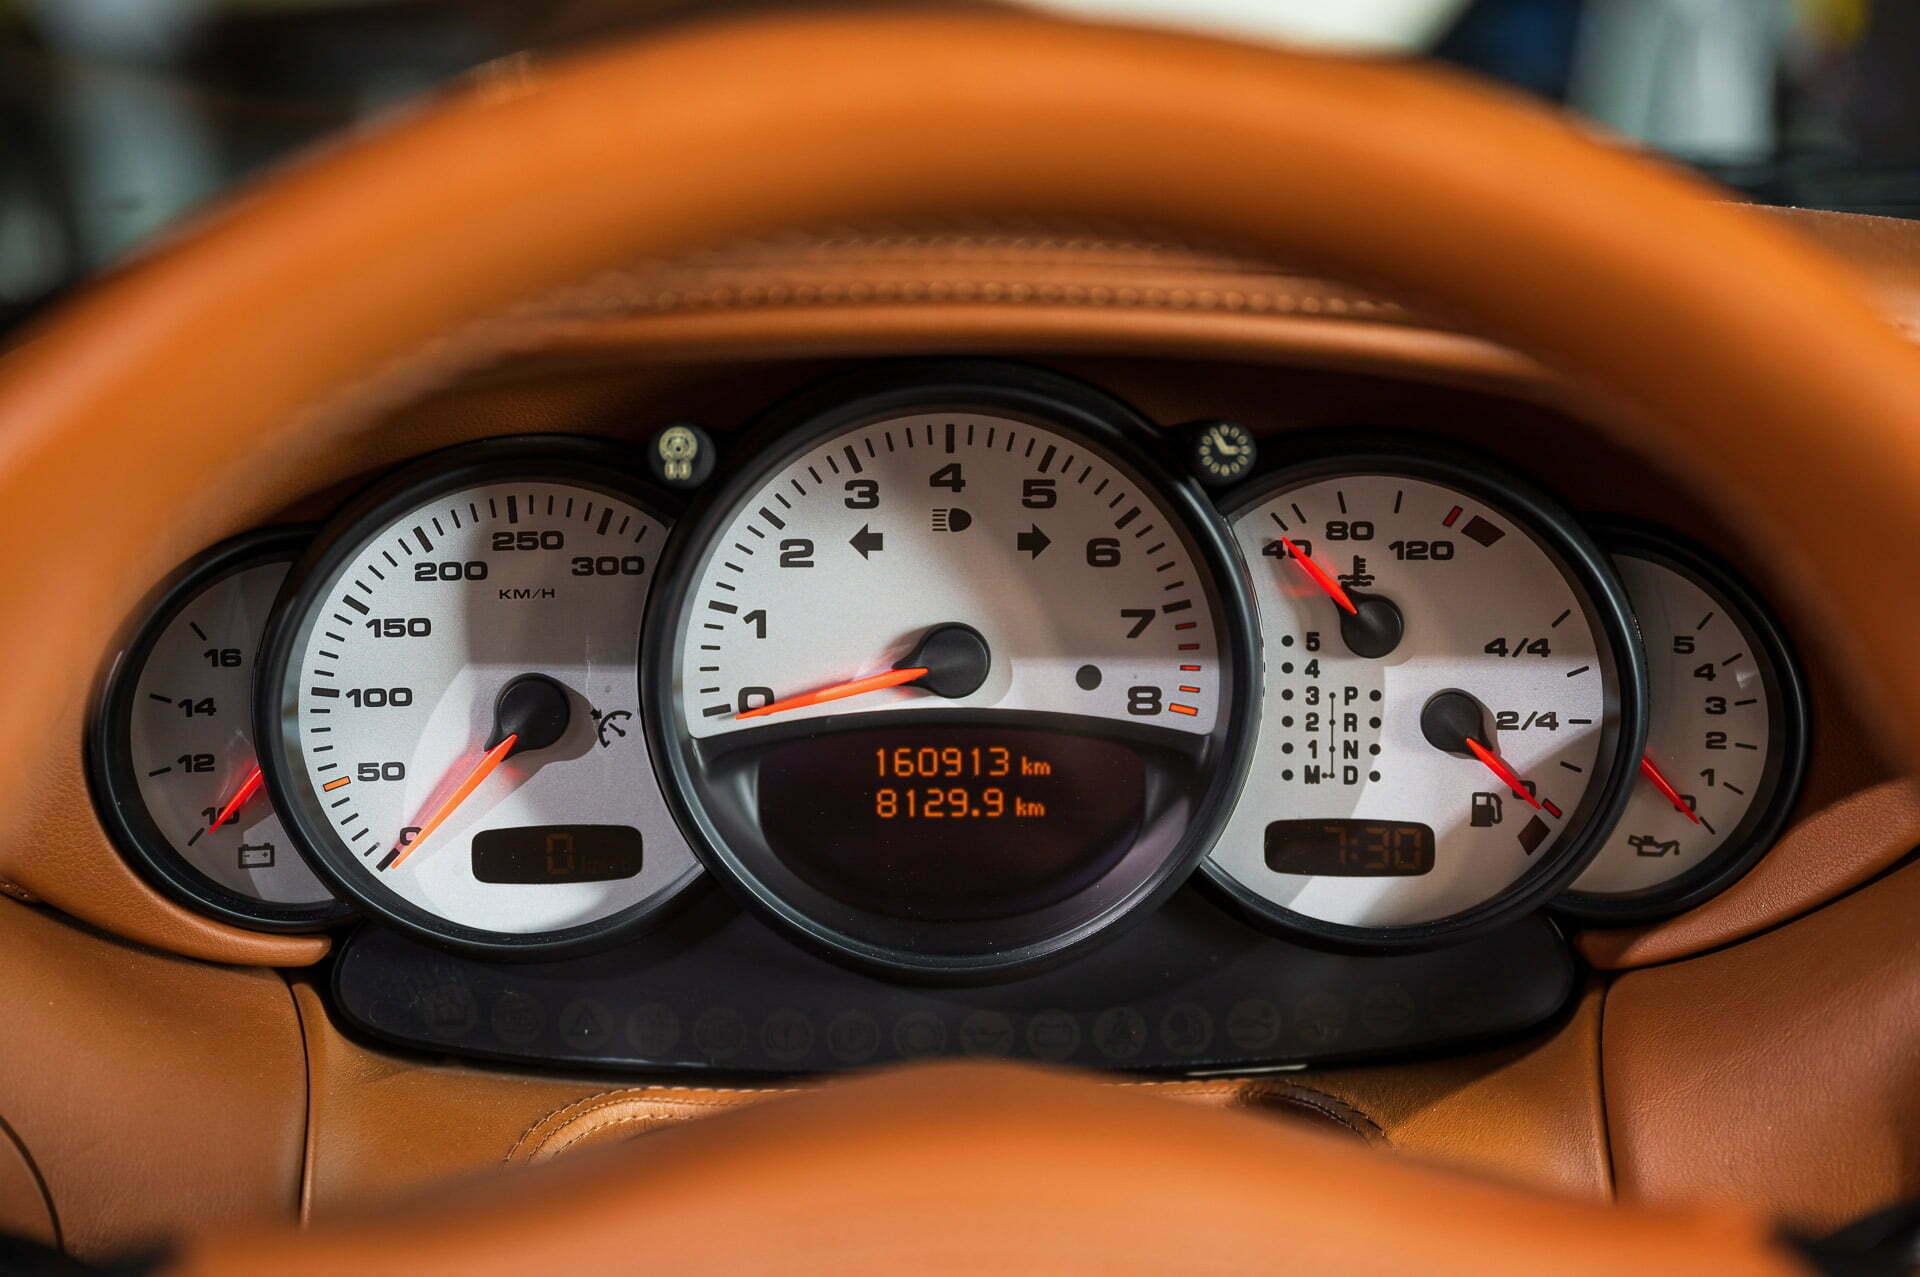 Porsche 996 Carrera 4 Coupe Automaat Basaltschwarz metallic Car Service Visser Gespecialiseerd in Porsche Hilversum